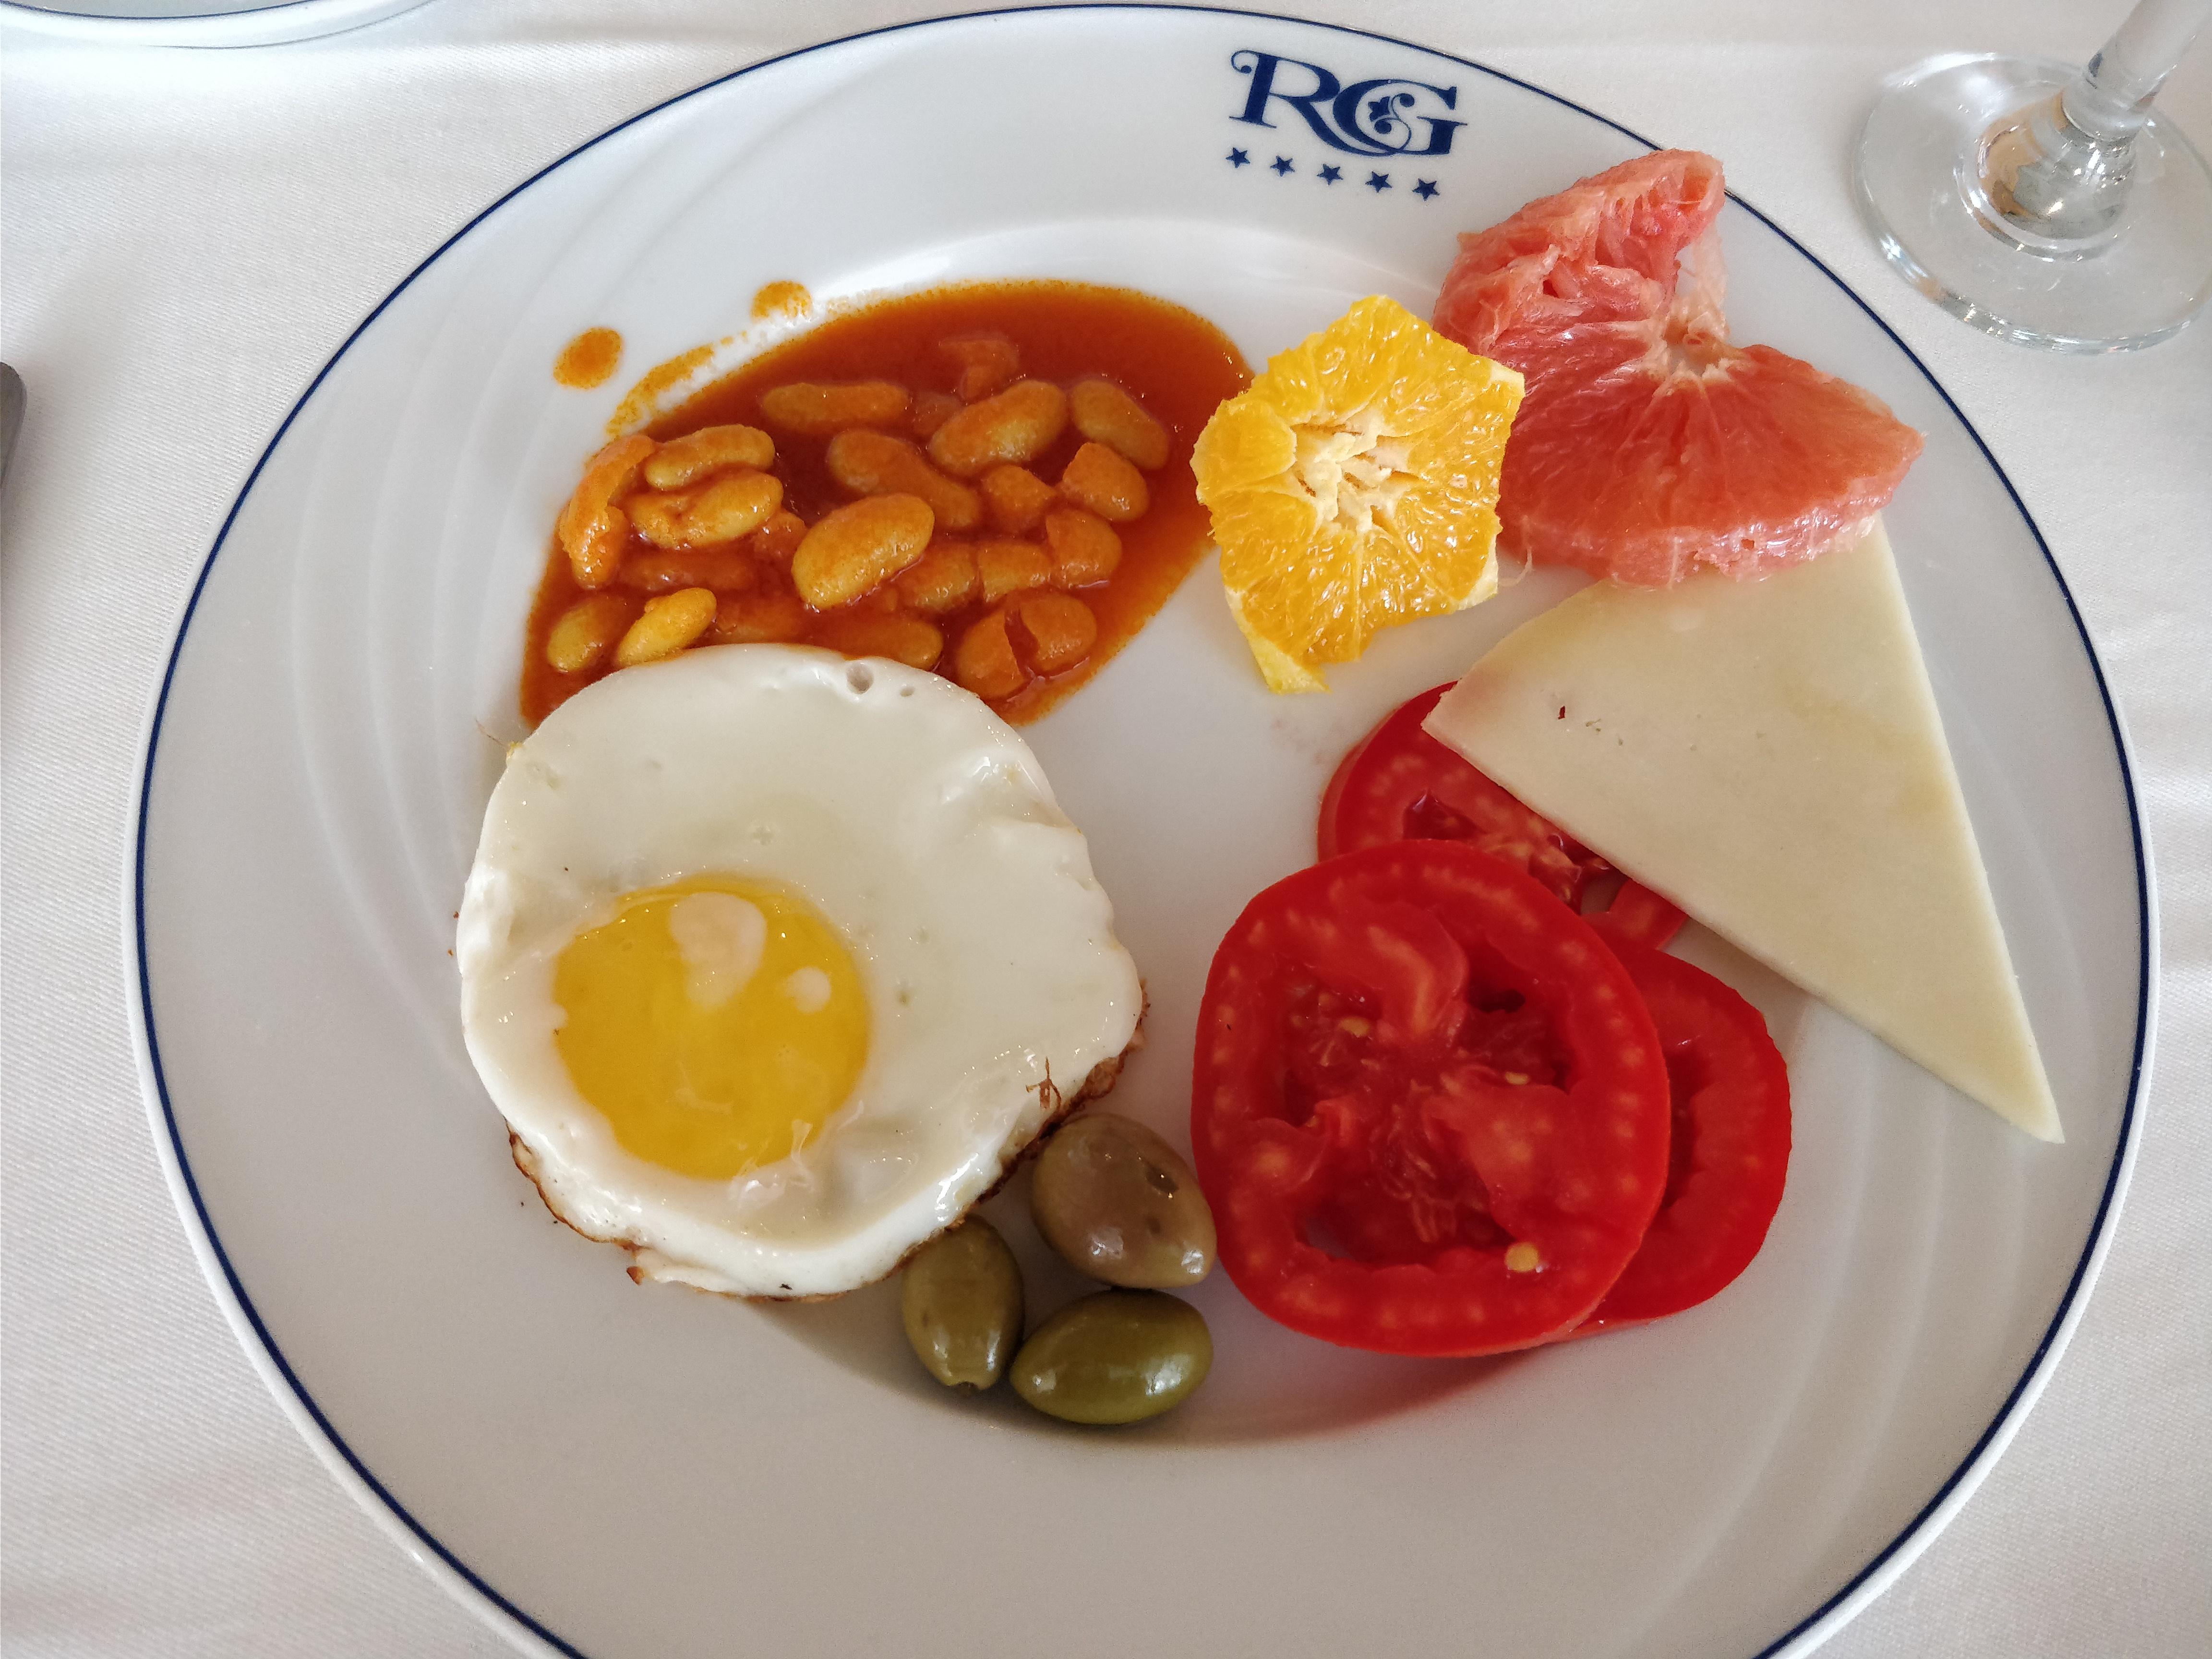 http://foodloader.net/nico_2017-08-12_royal-garden-palace-fruehstueck-1.jpg